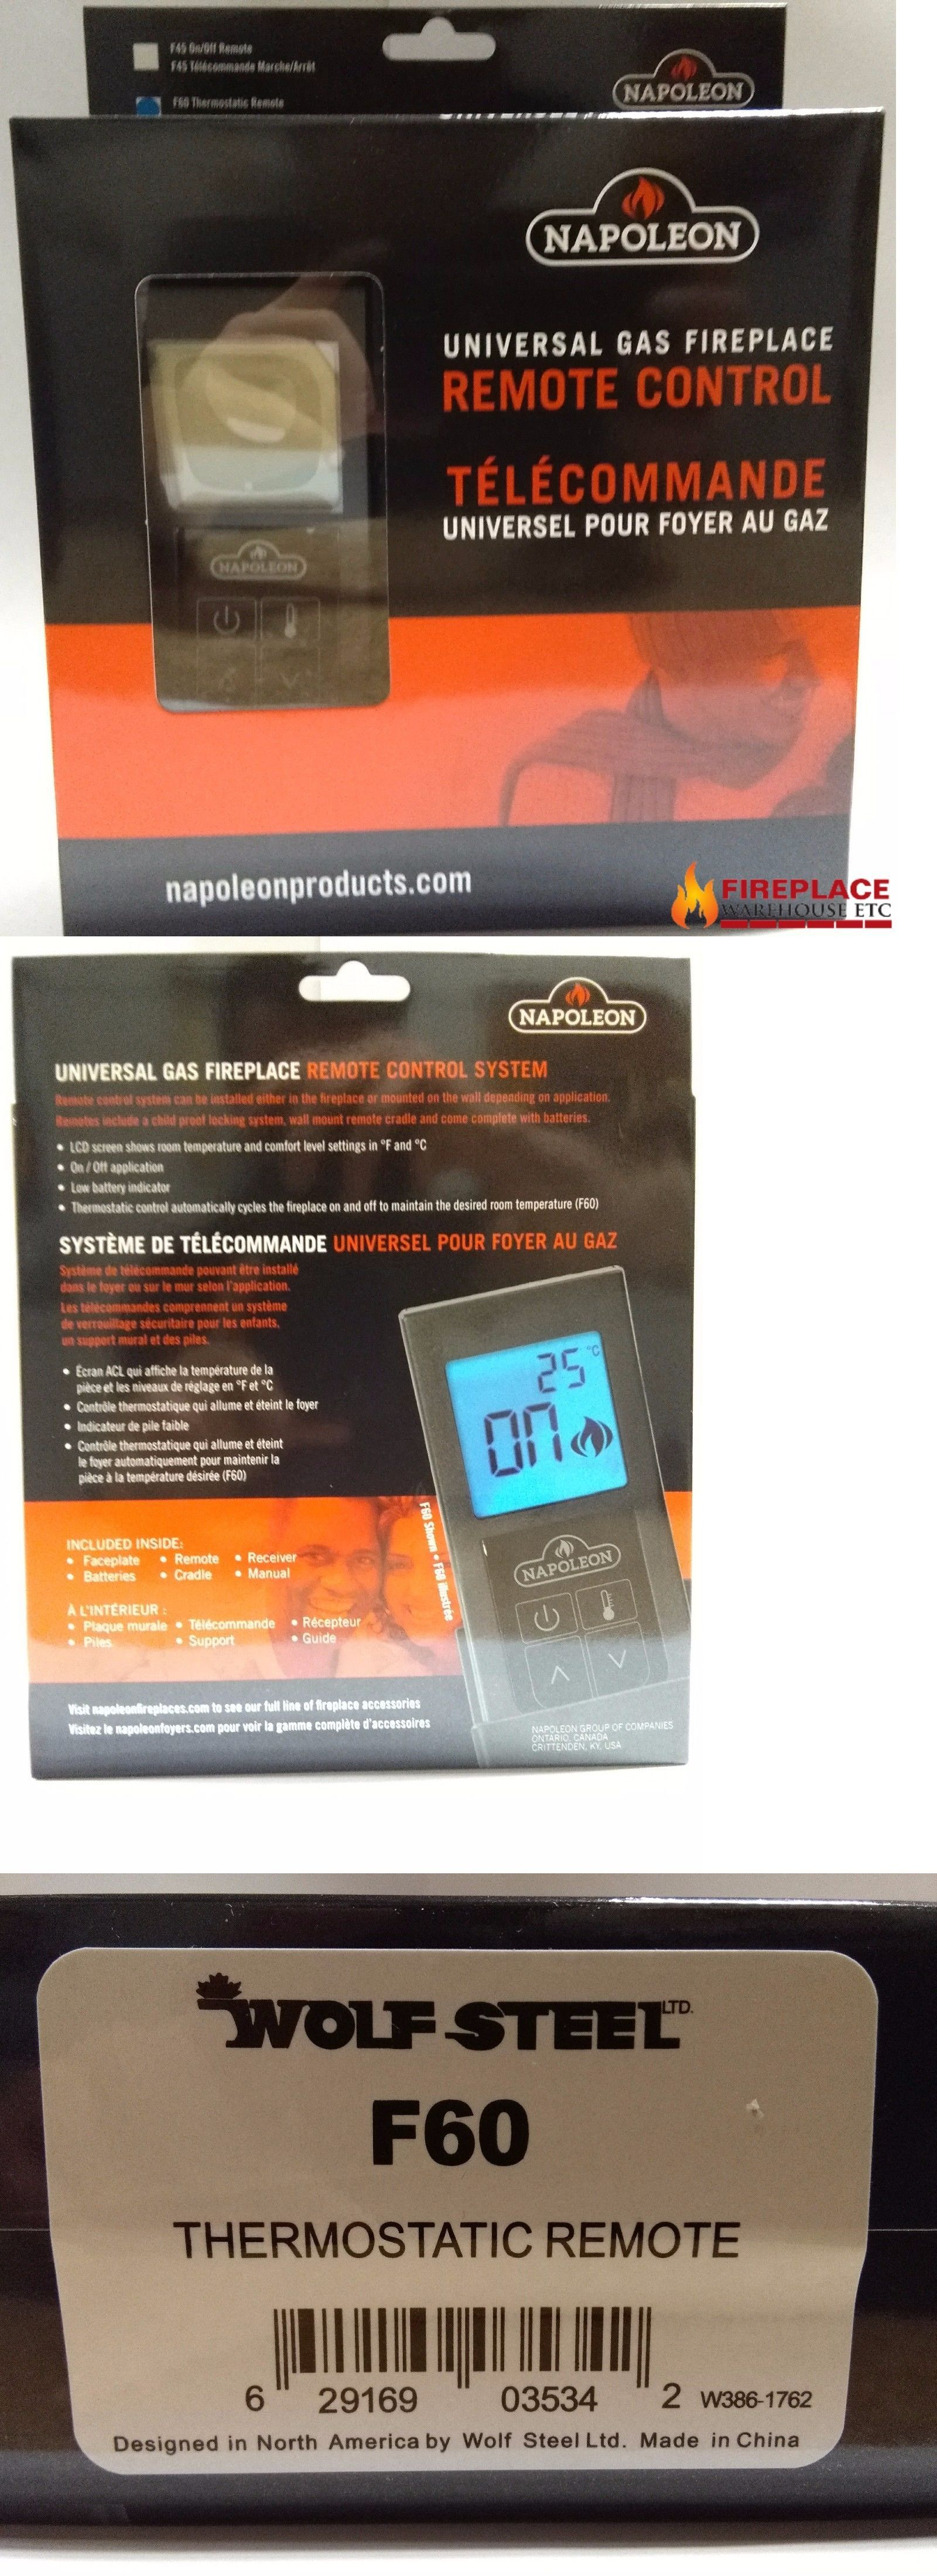 remote controls universal gas fireplace remote control napoleon